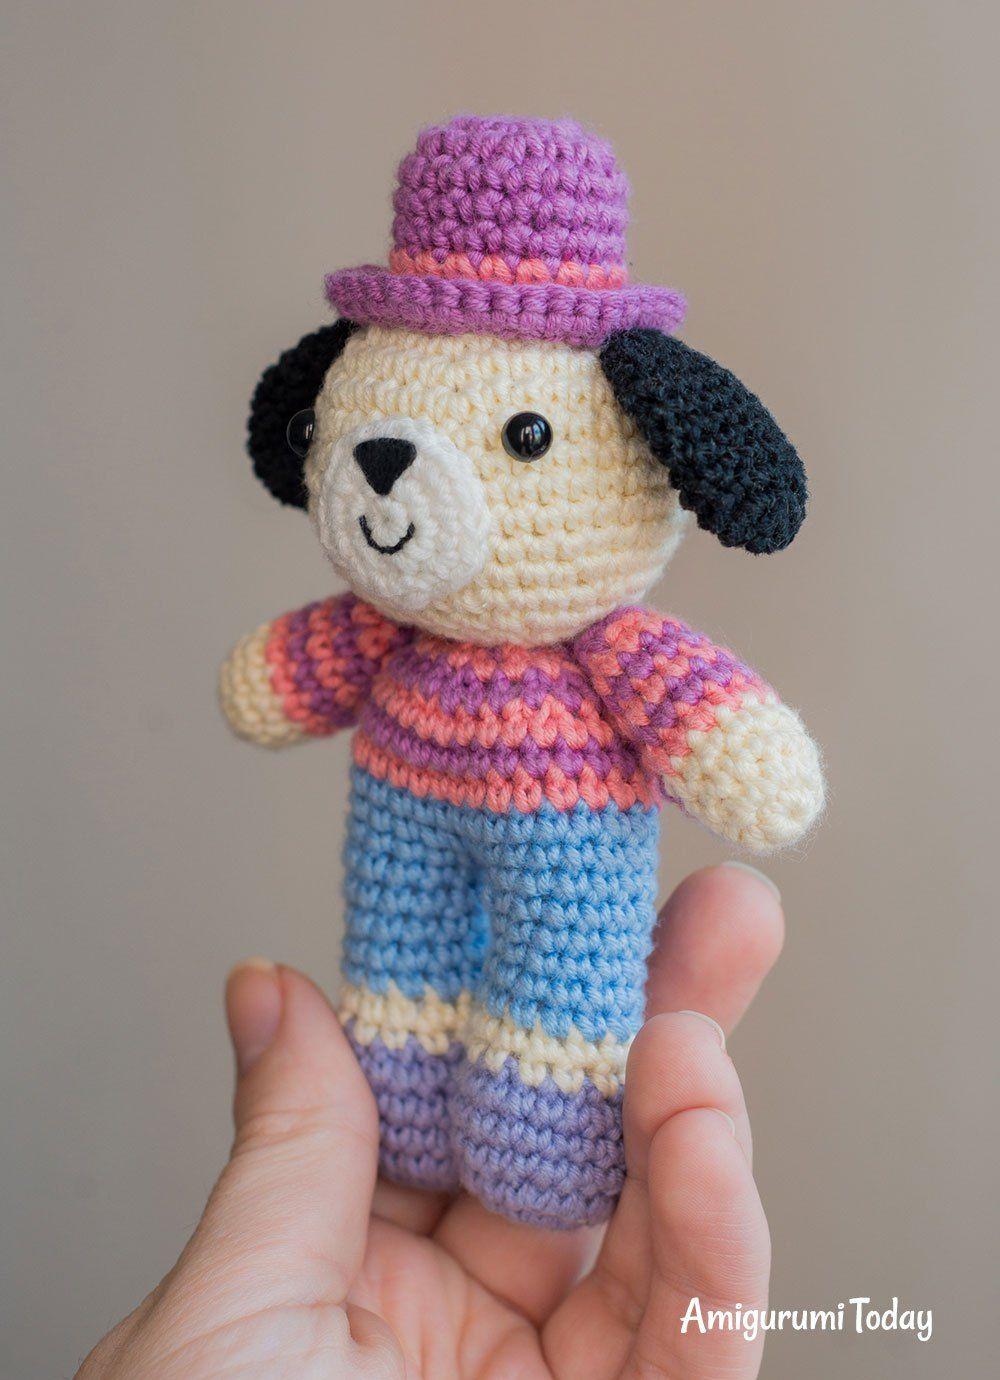 Charlie the Dog crochet pattern | Häkelmuster, Amigurumi häkeln und ...